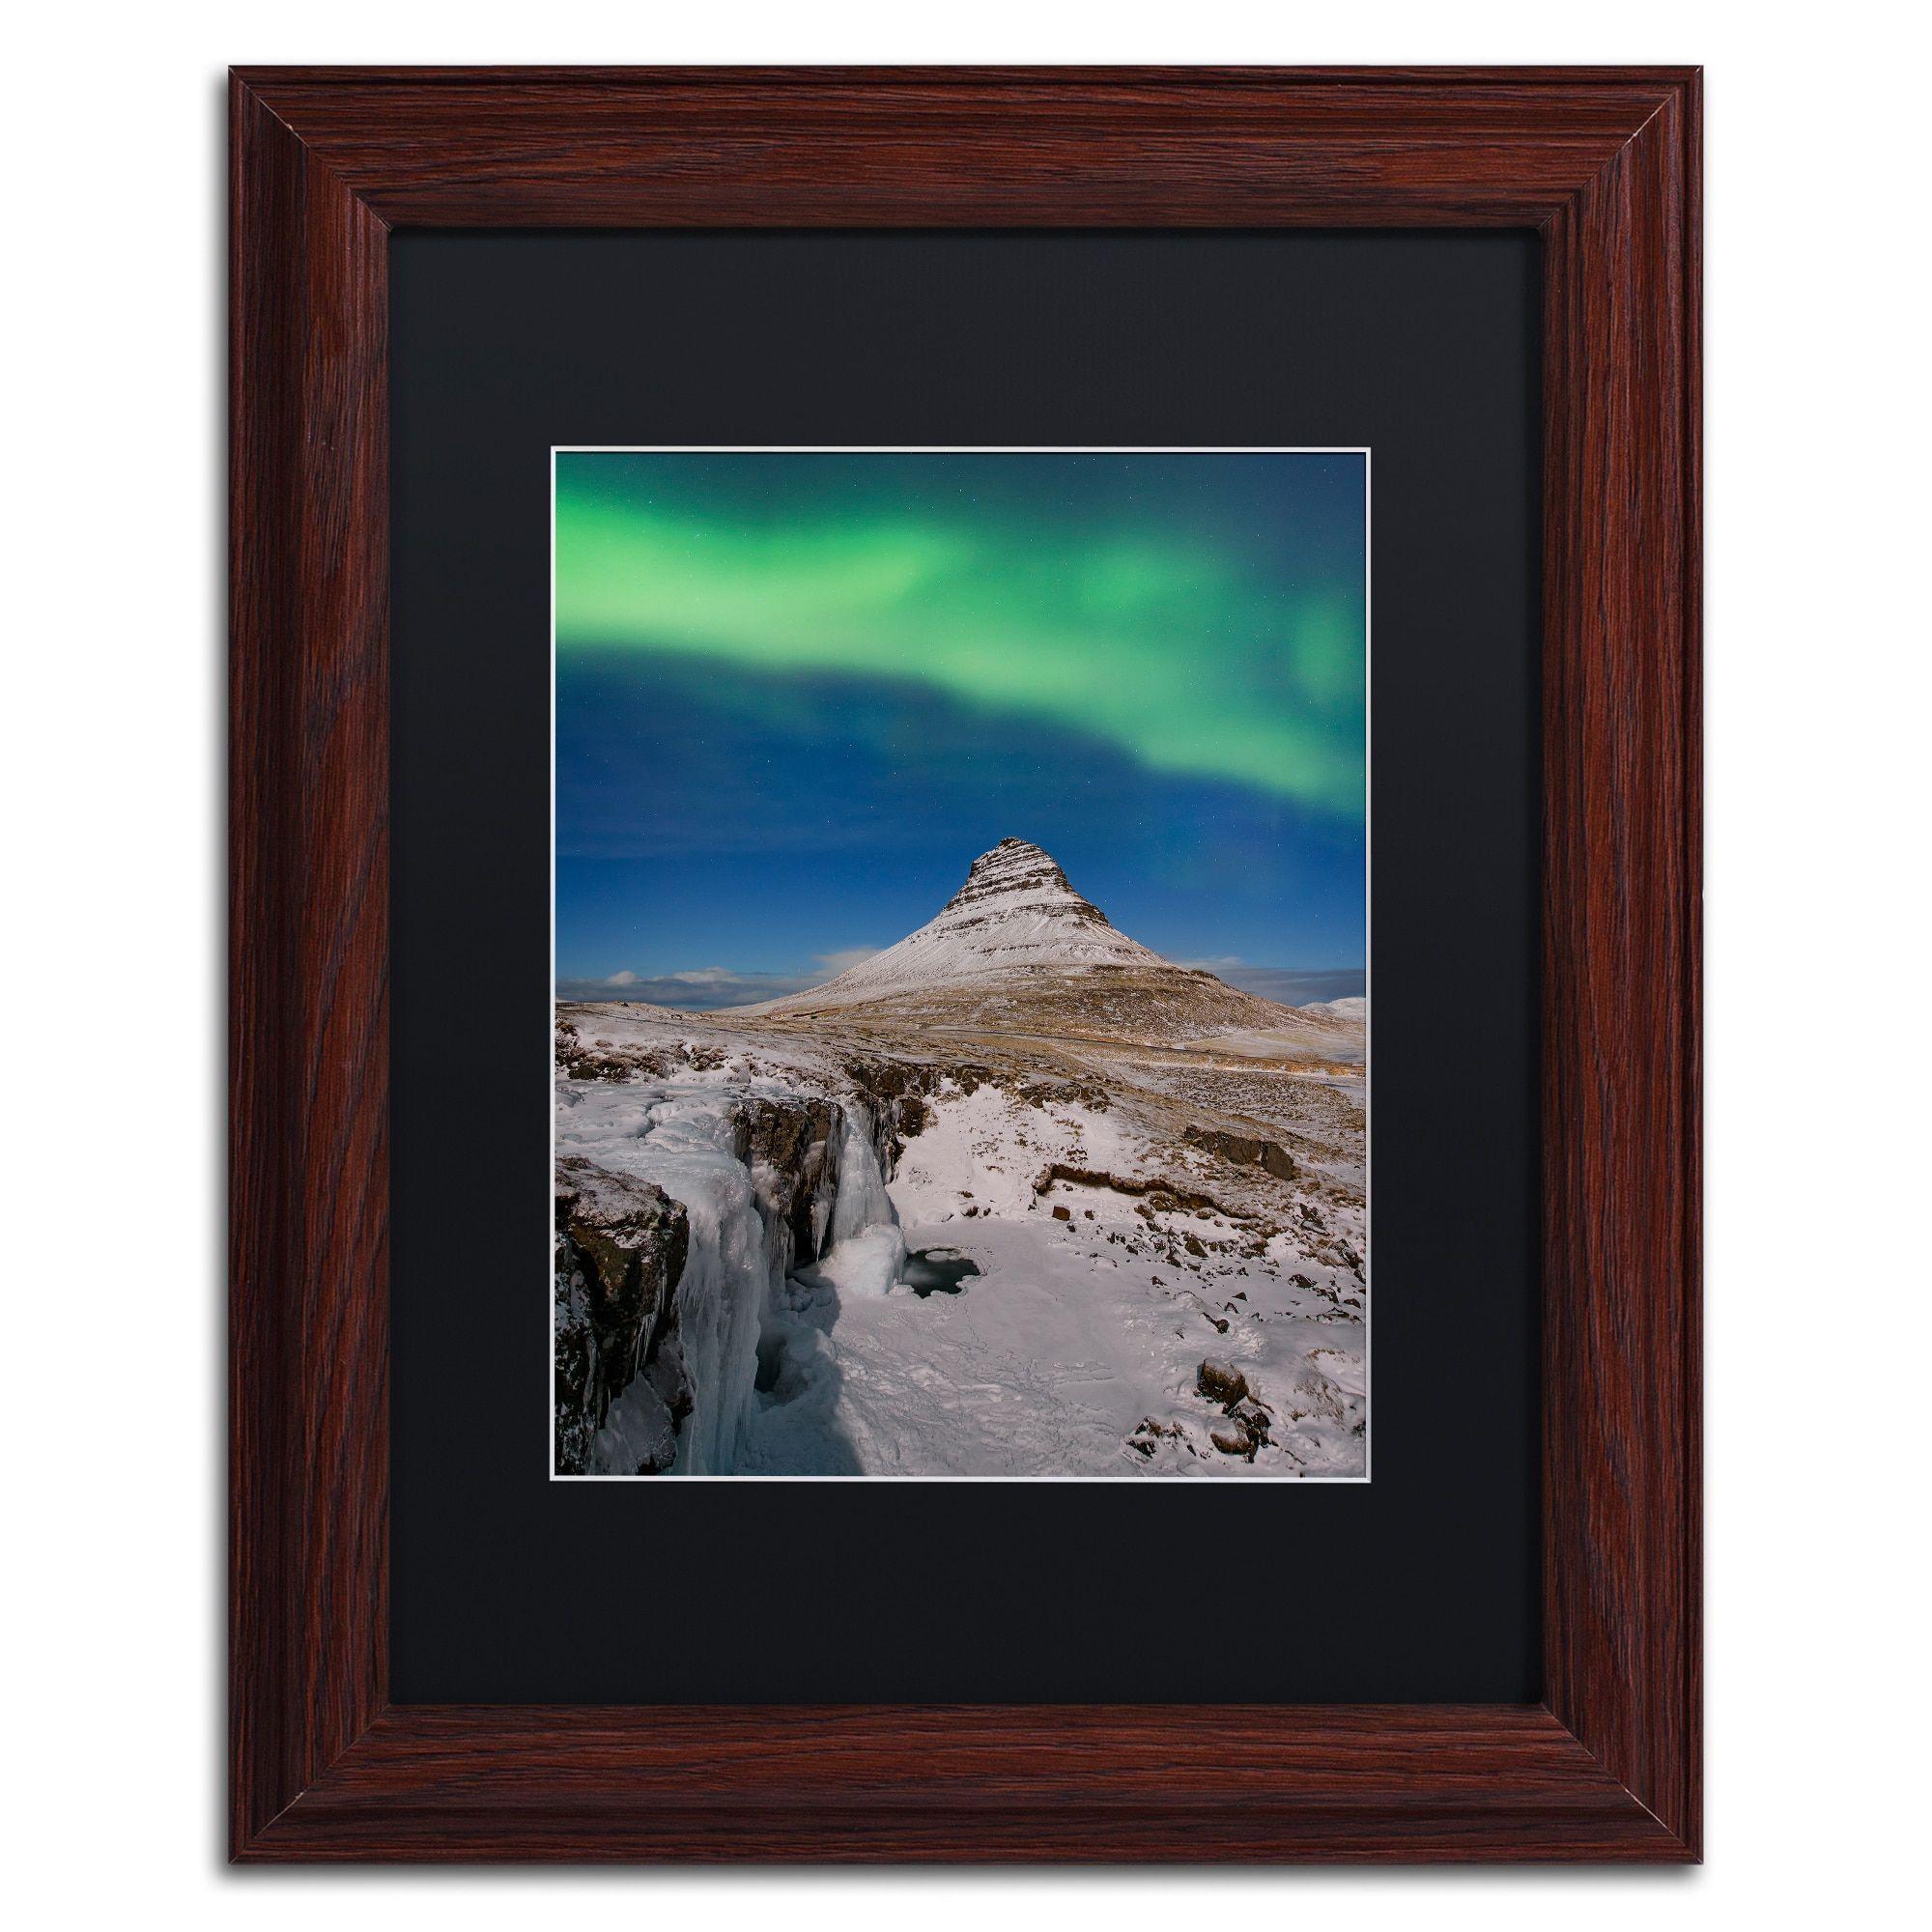 Michael blanchette photography ugreen bandanau matted framed art